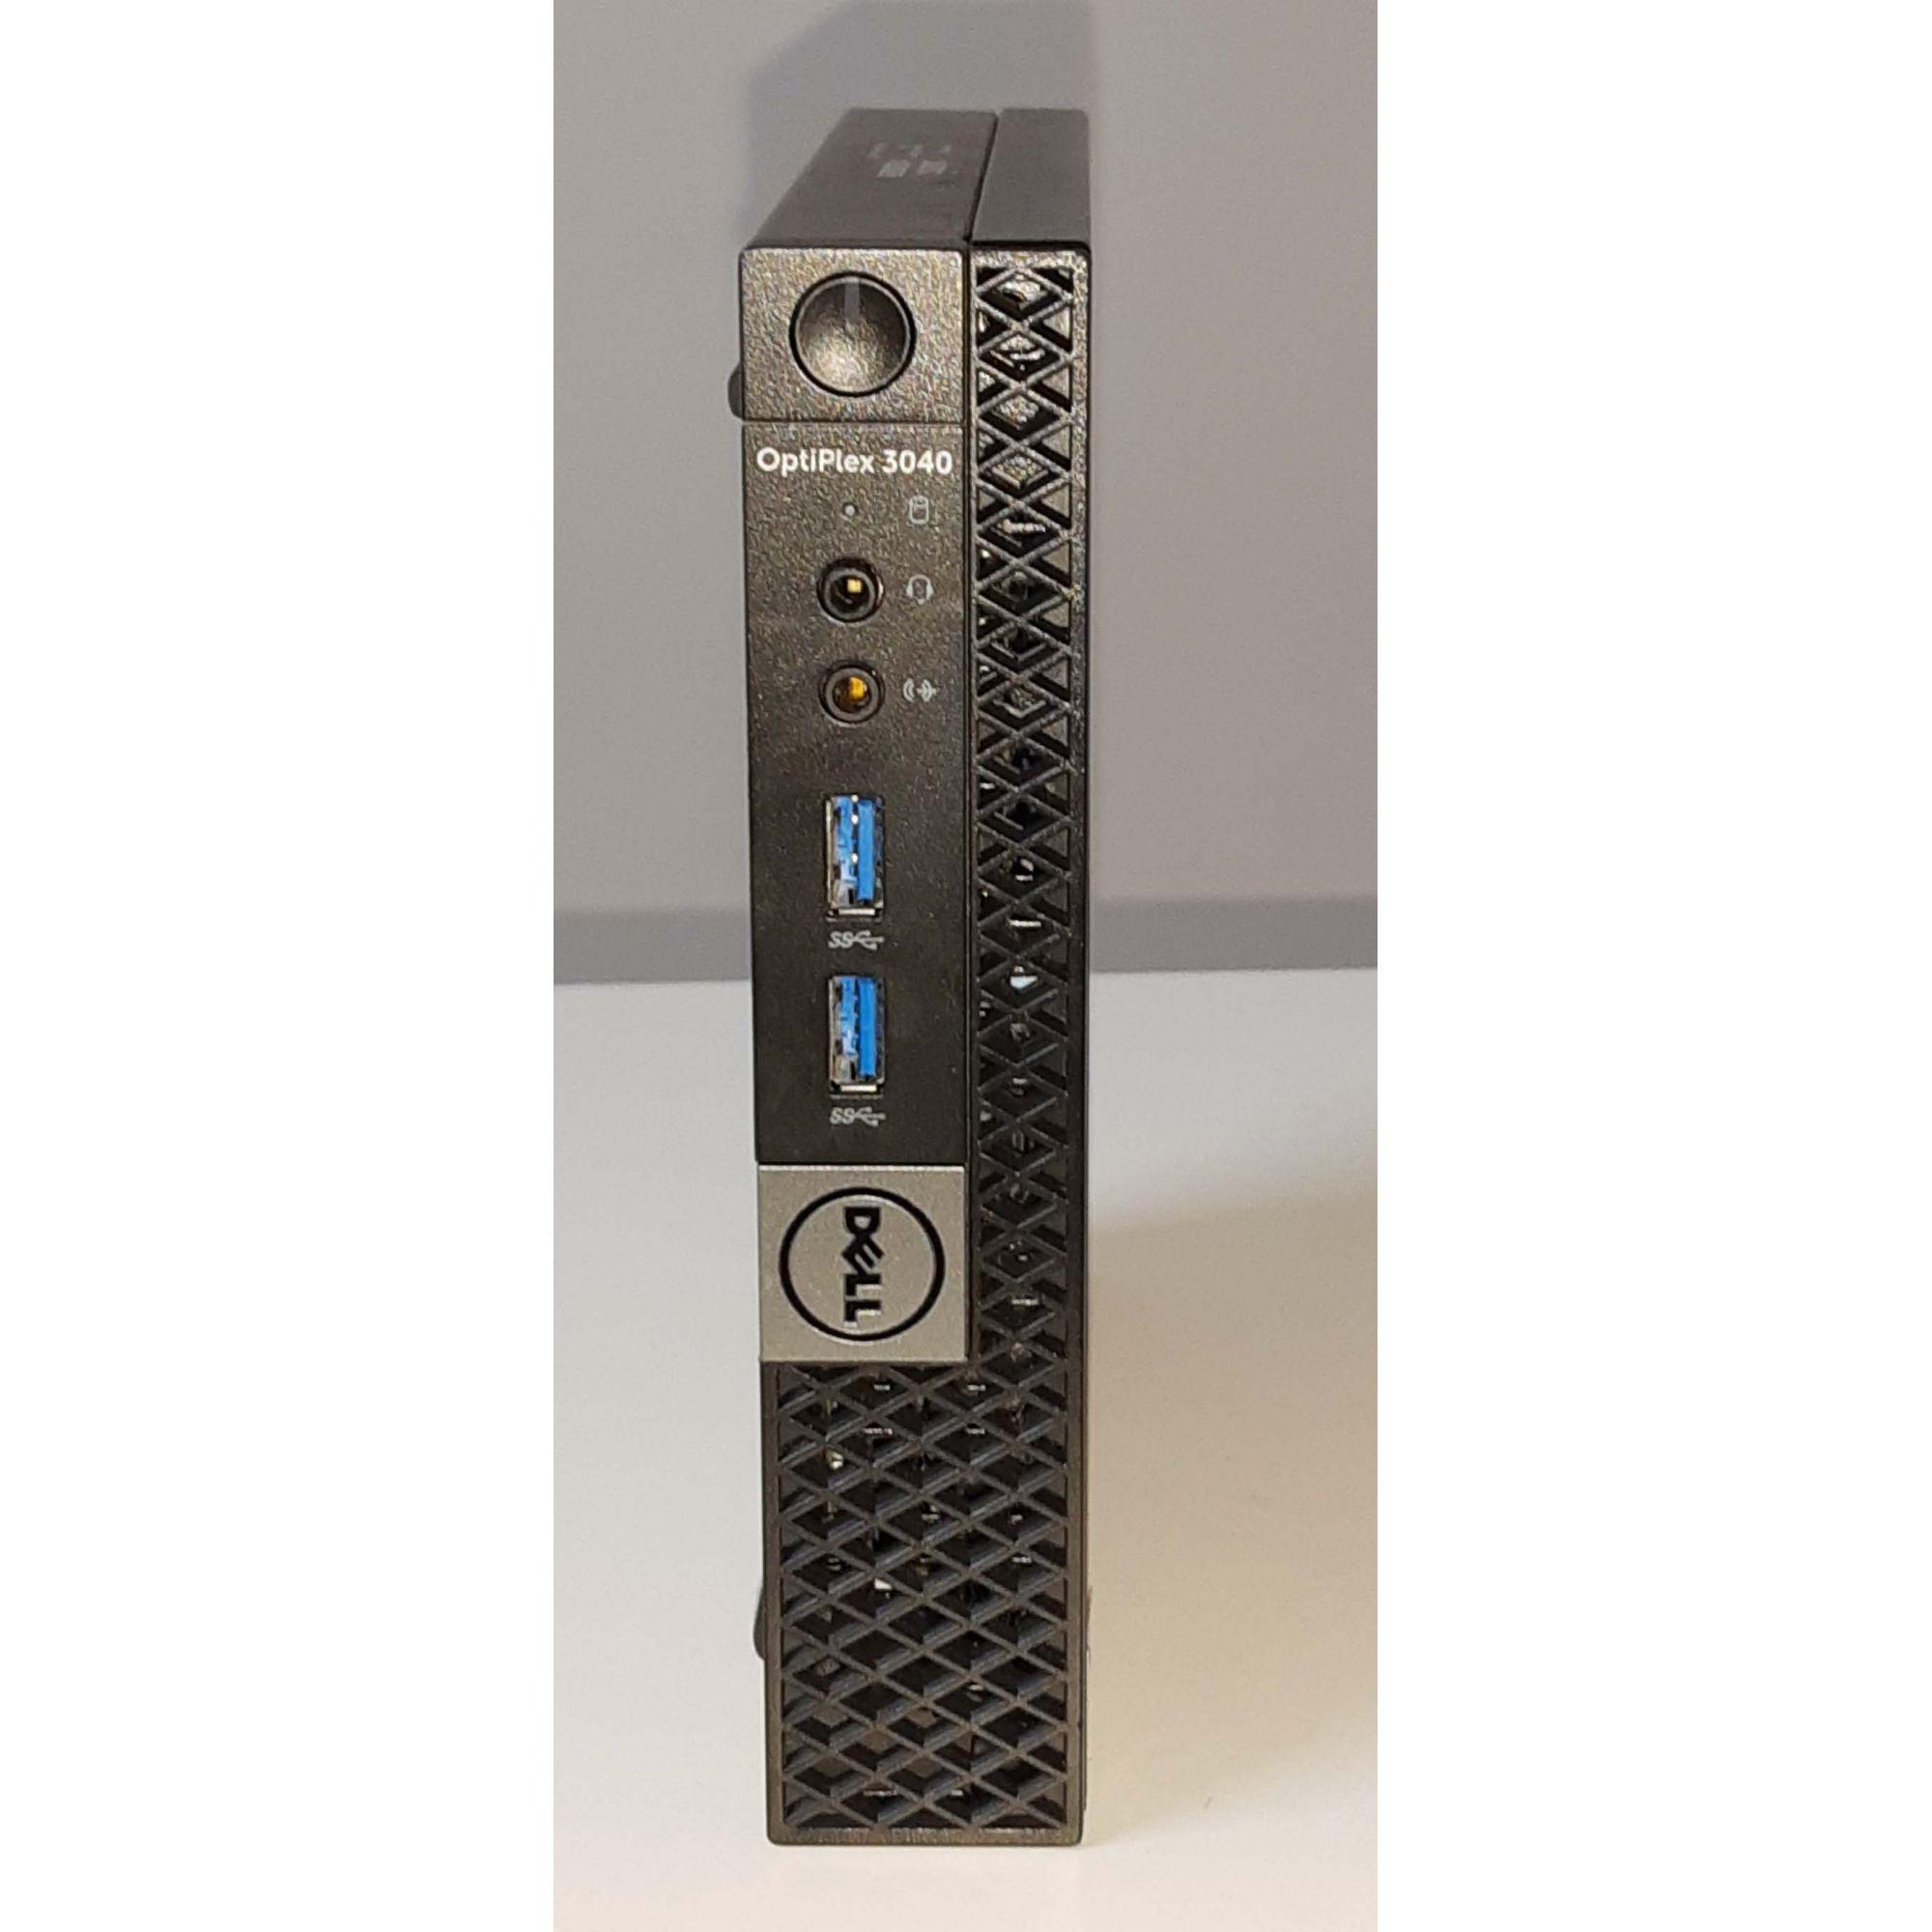 Micro CPU  Optiplex 3040 i7-6700 3.4GHz, 16GB, 1TB - único no ML